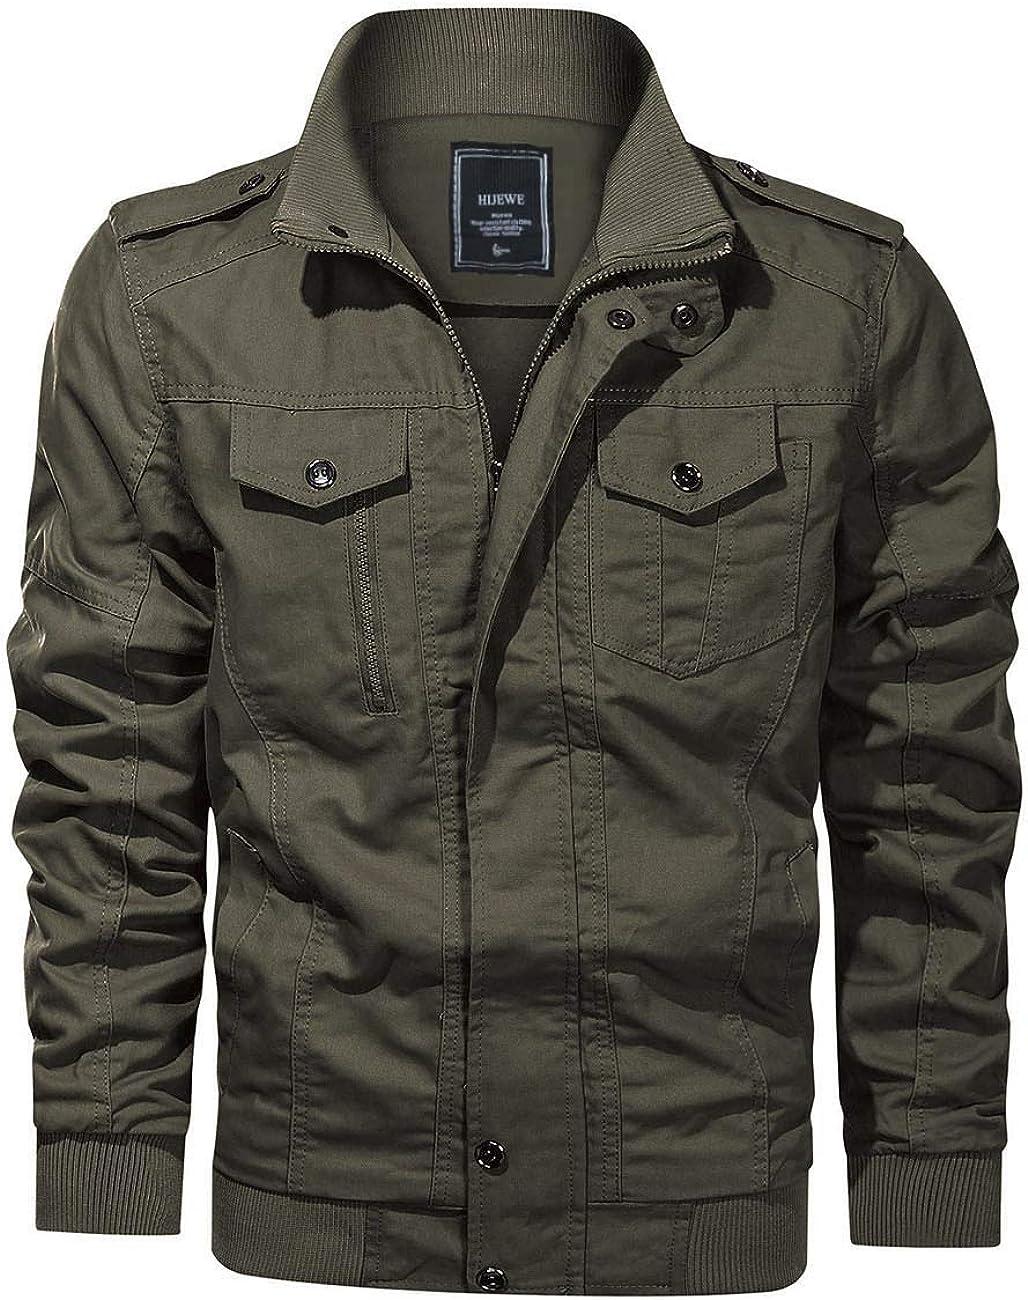 Men's Military Jacket Cargo Casual Coat Lightweight Outwear Cotton Stand Collar Windbreaker